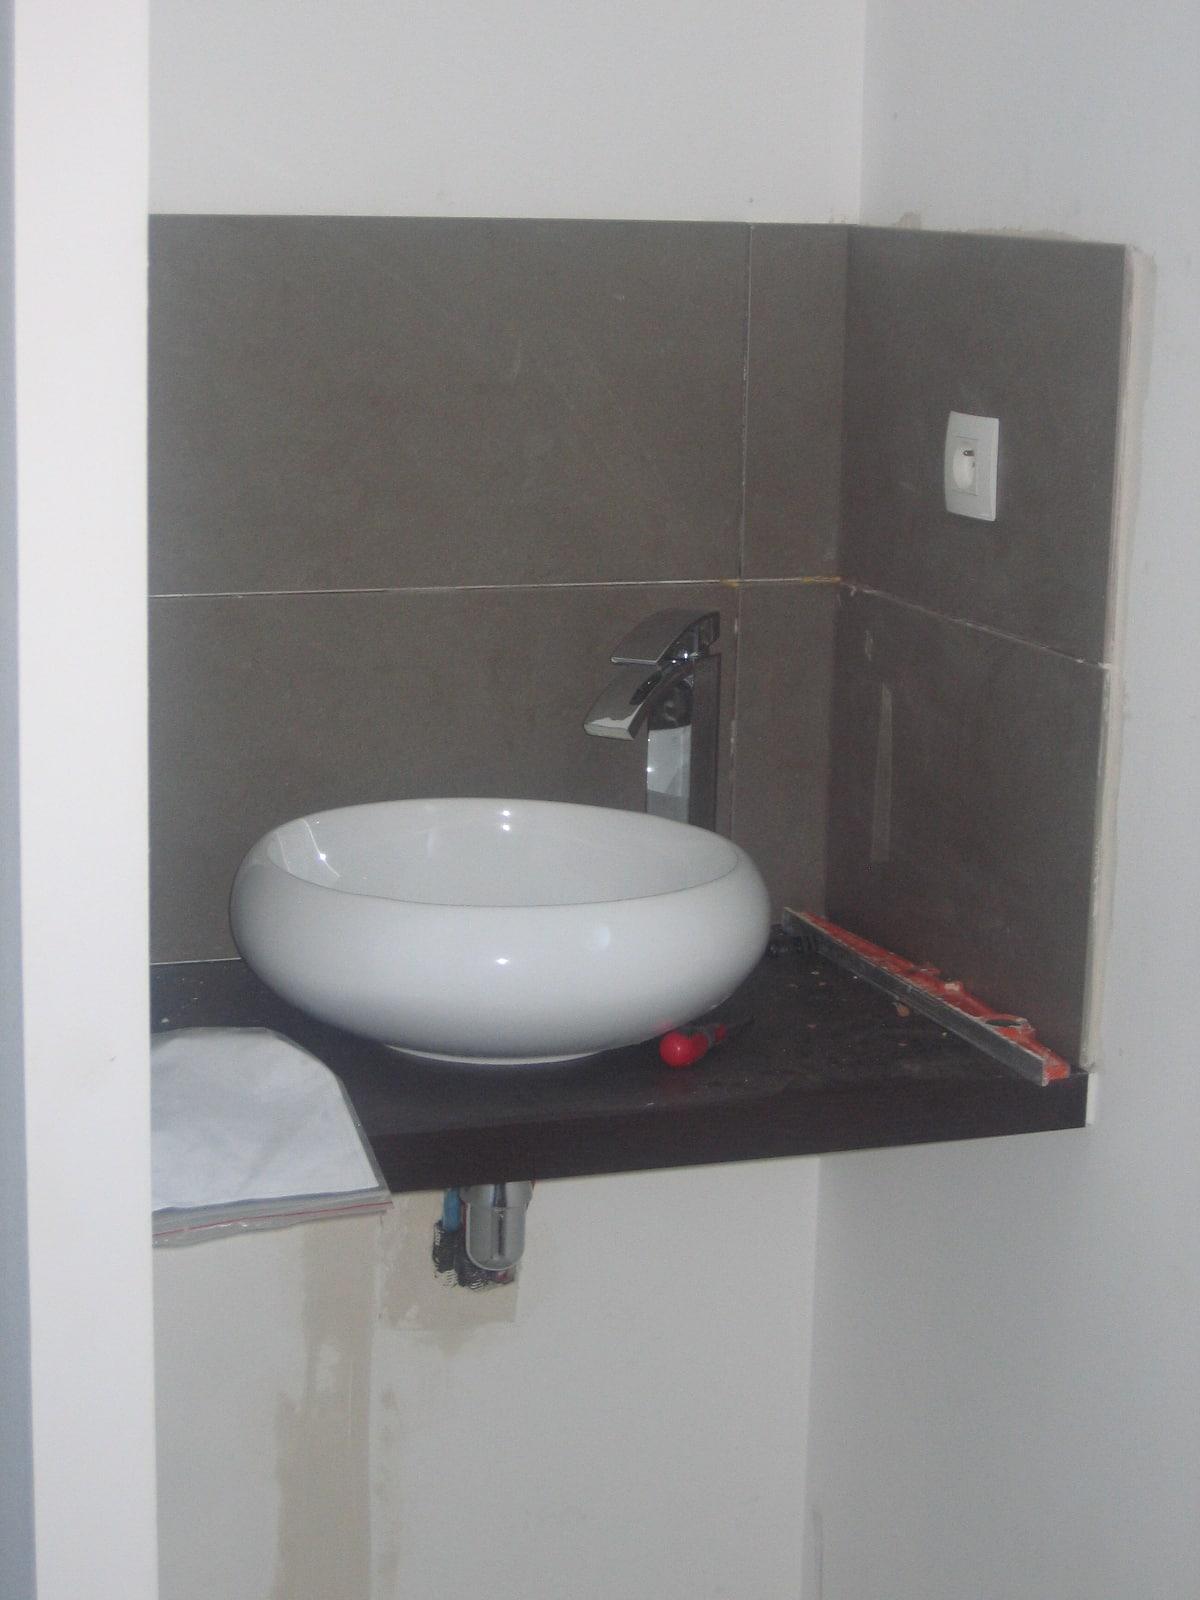 sanitaire faience evier lavabo lave main cedeo 49800 sarrigne